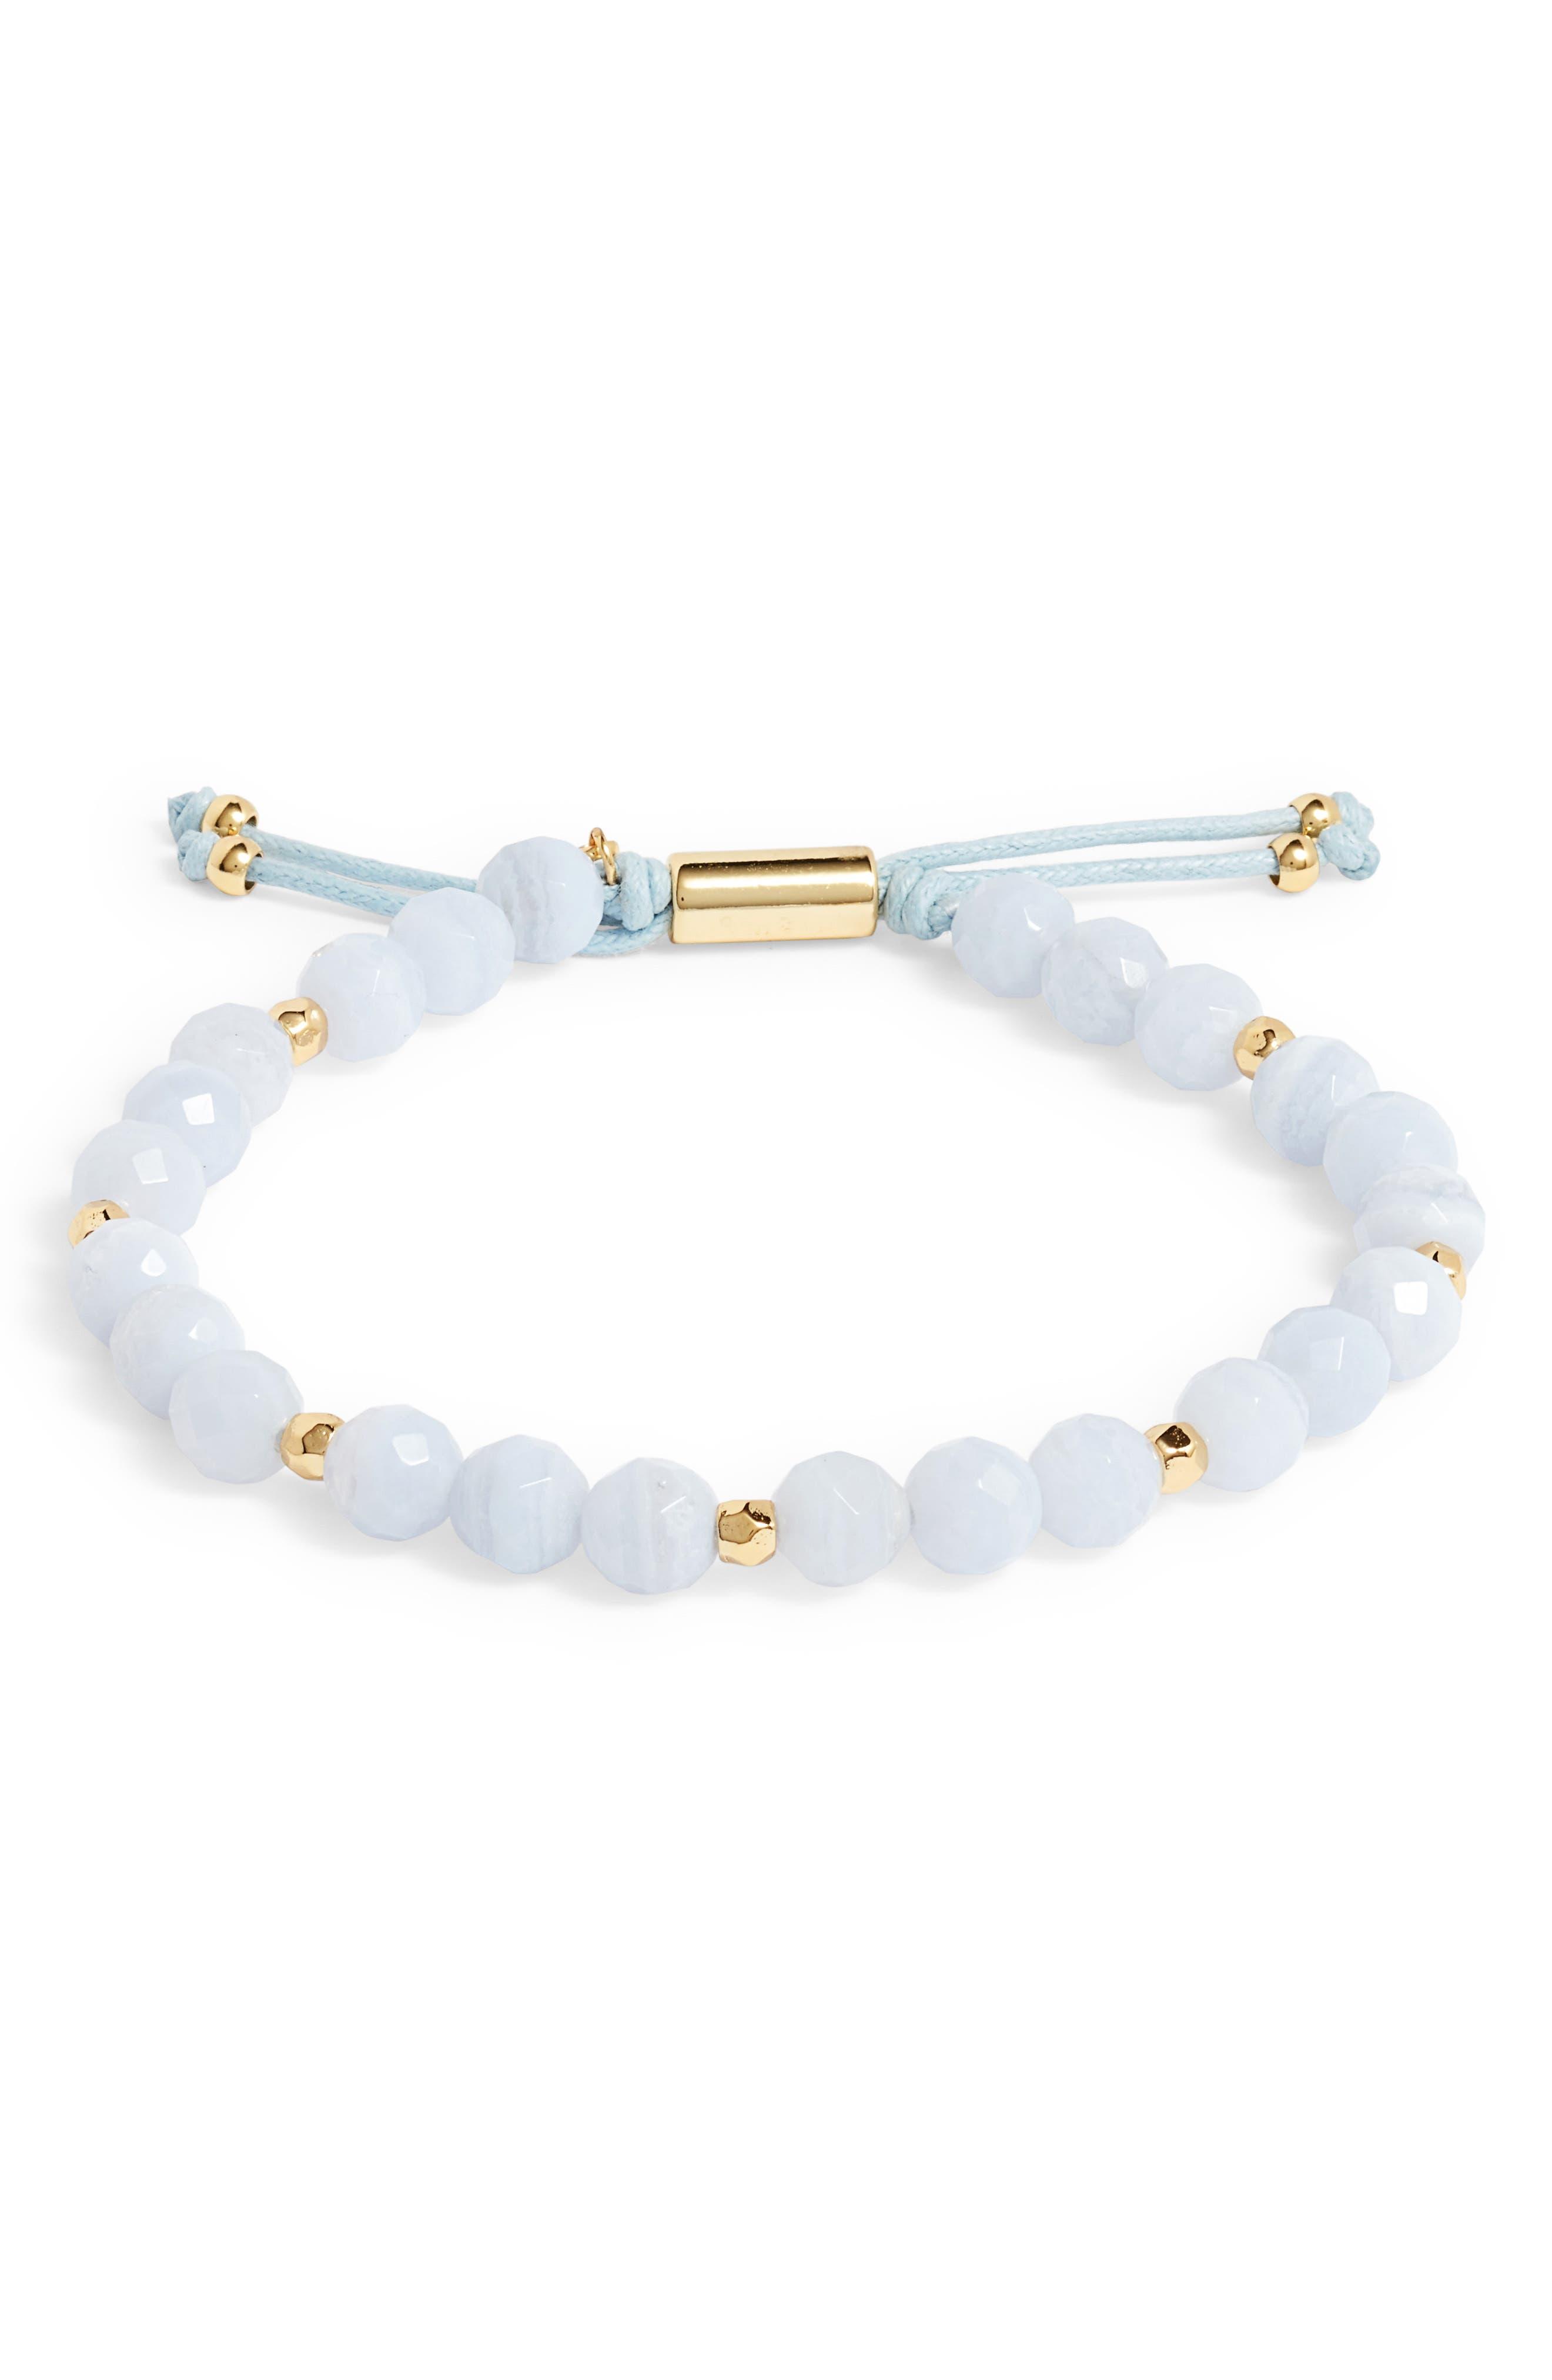 Power Gemstone Beaded Bracelet,                             Main thumbnail 1, color,                             Blue Lace Agate/ Gold